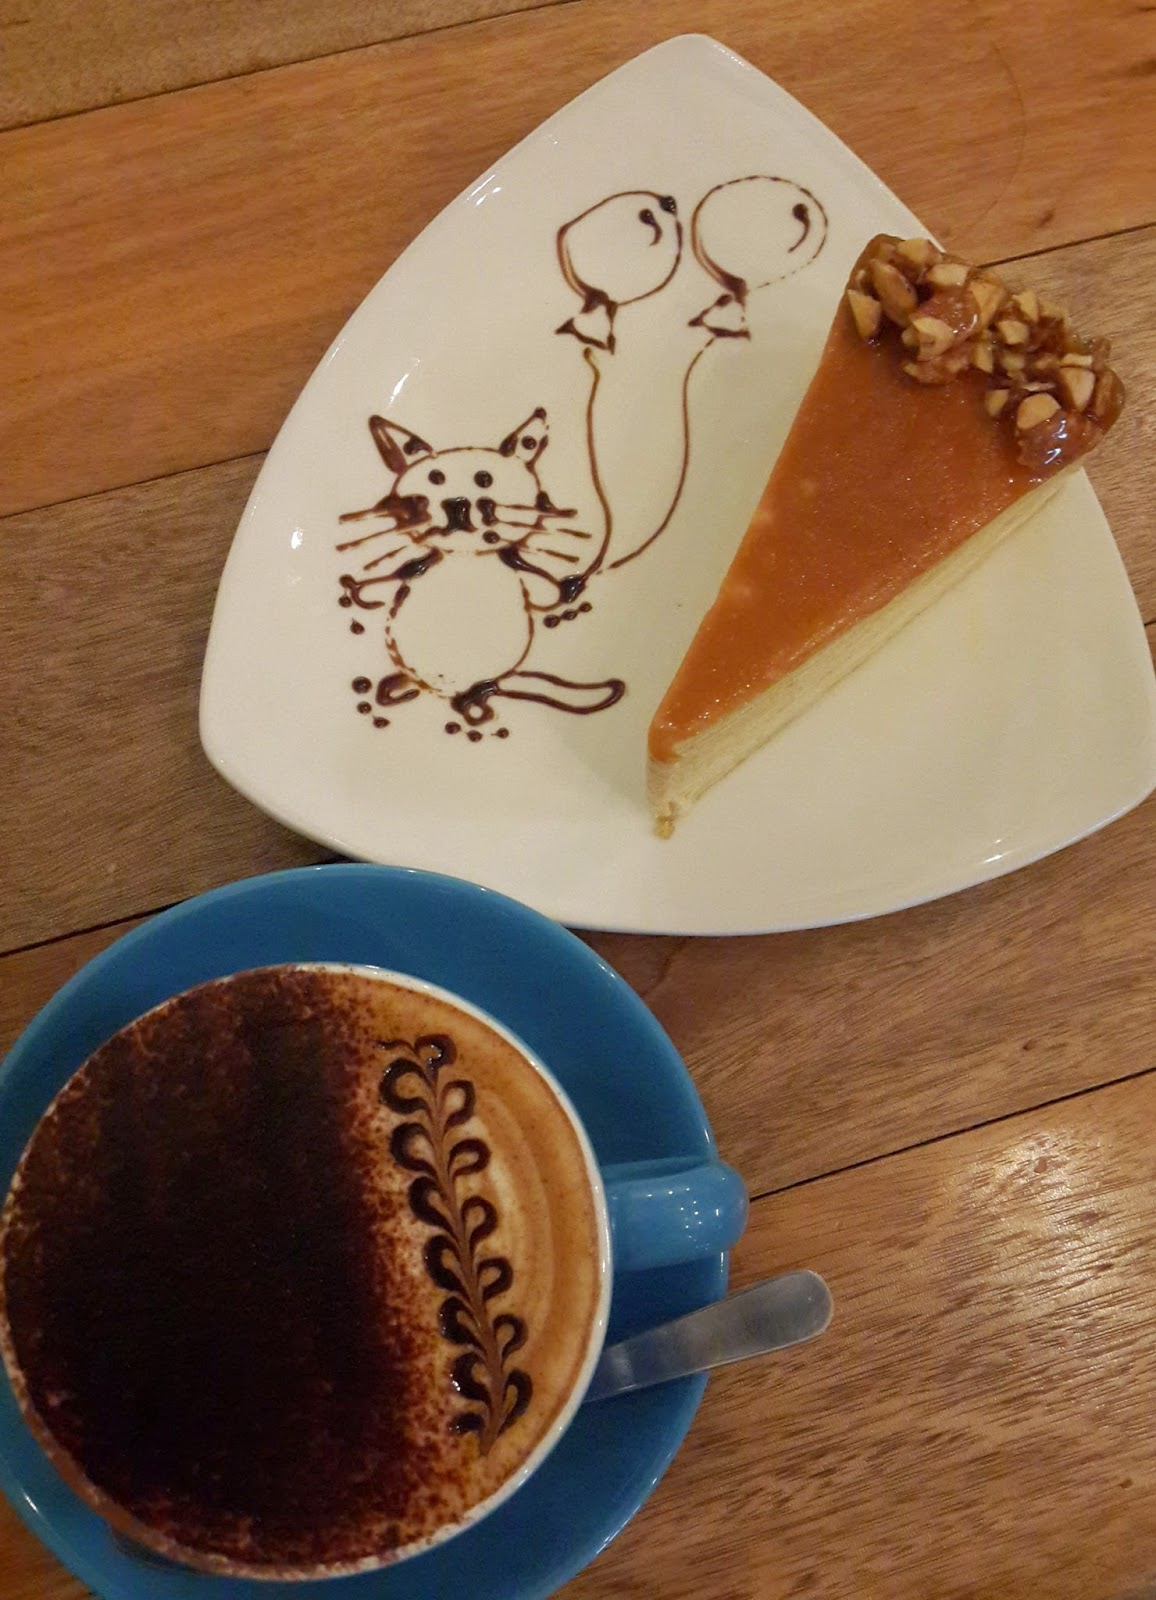 lurvethelife: CAFFEine; Setia Walk, Puchong.